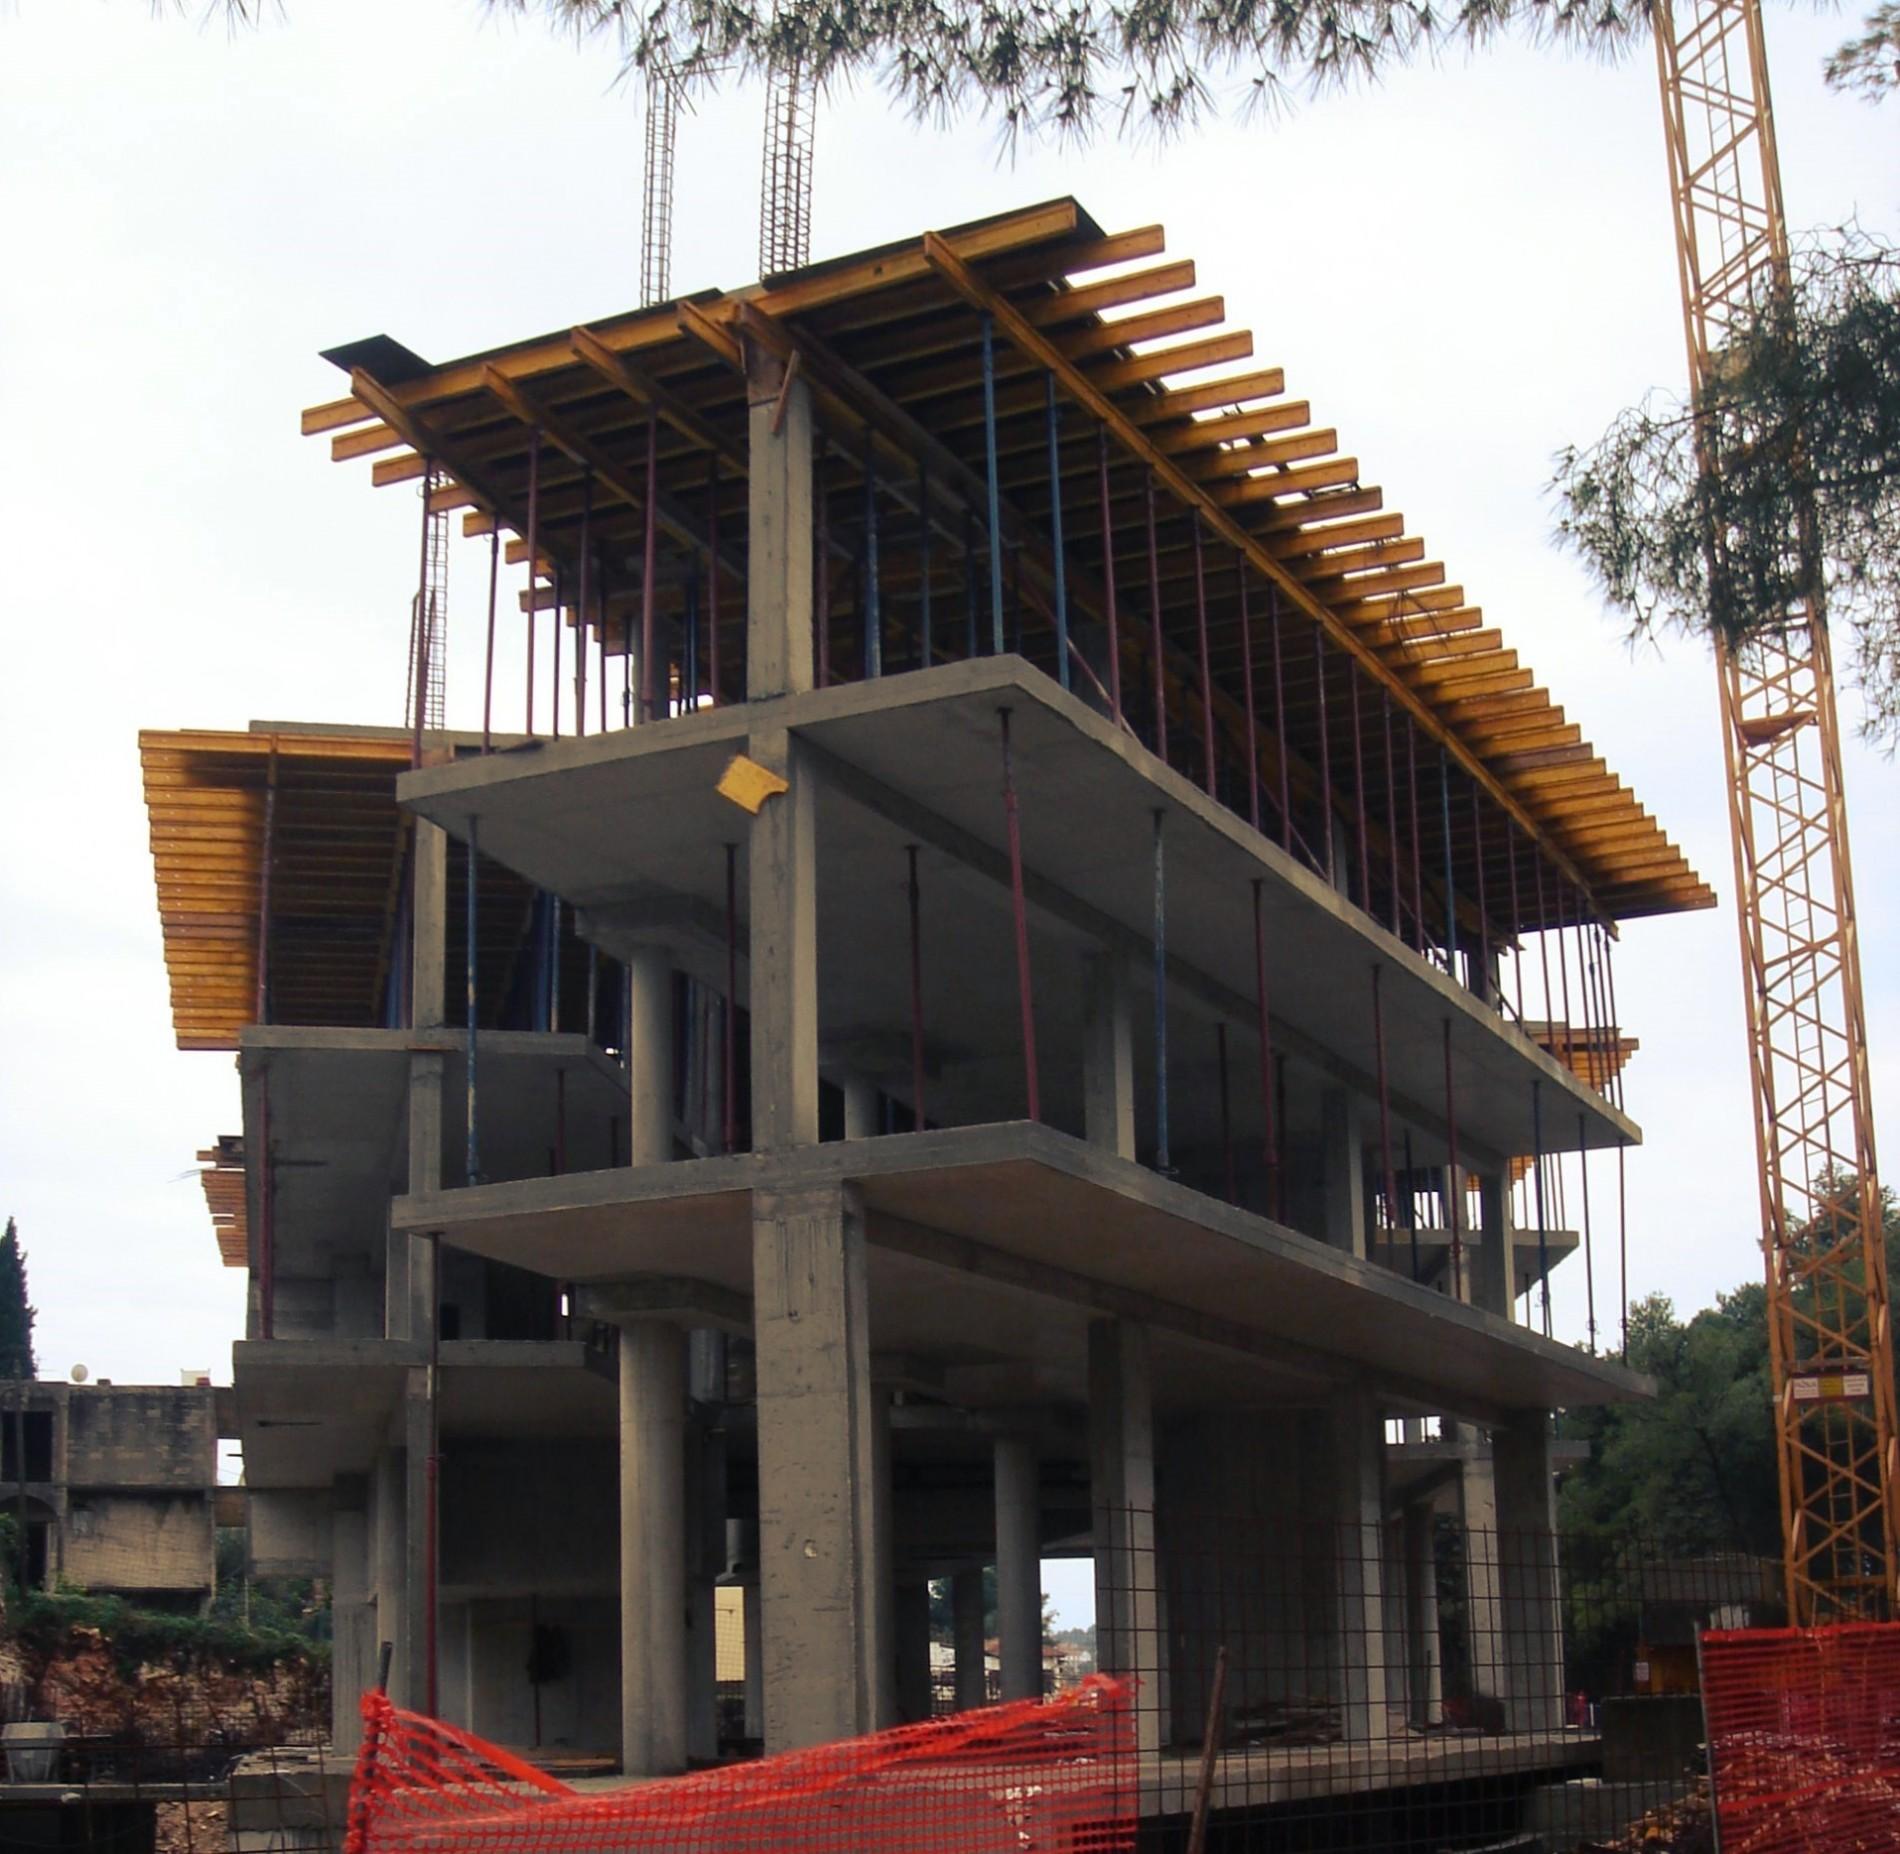 superdamacija, superdalmatia, upi-2m, njirić+ arhitekti, structure, konstrukcija